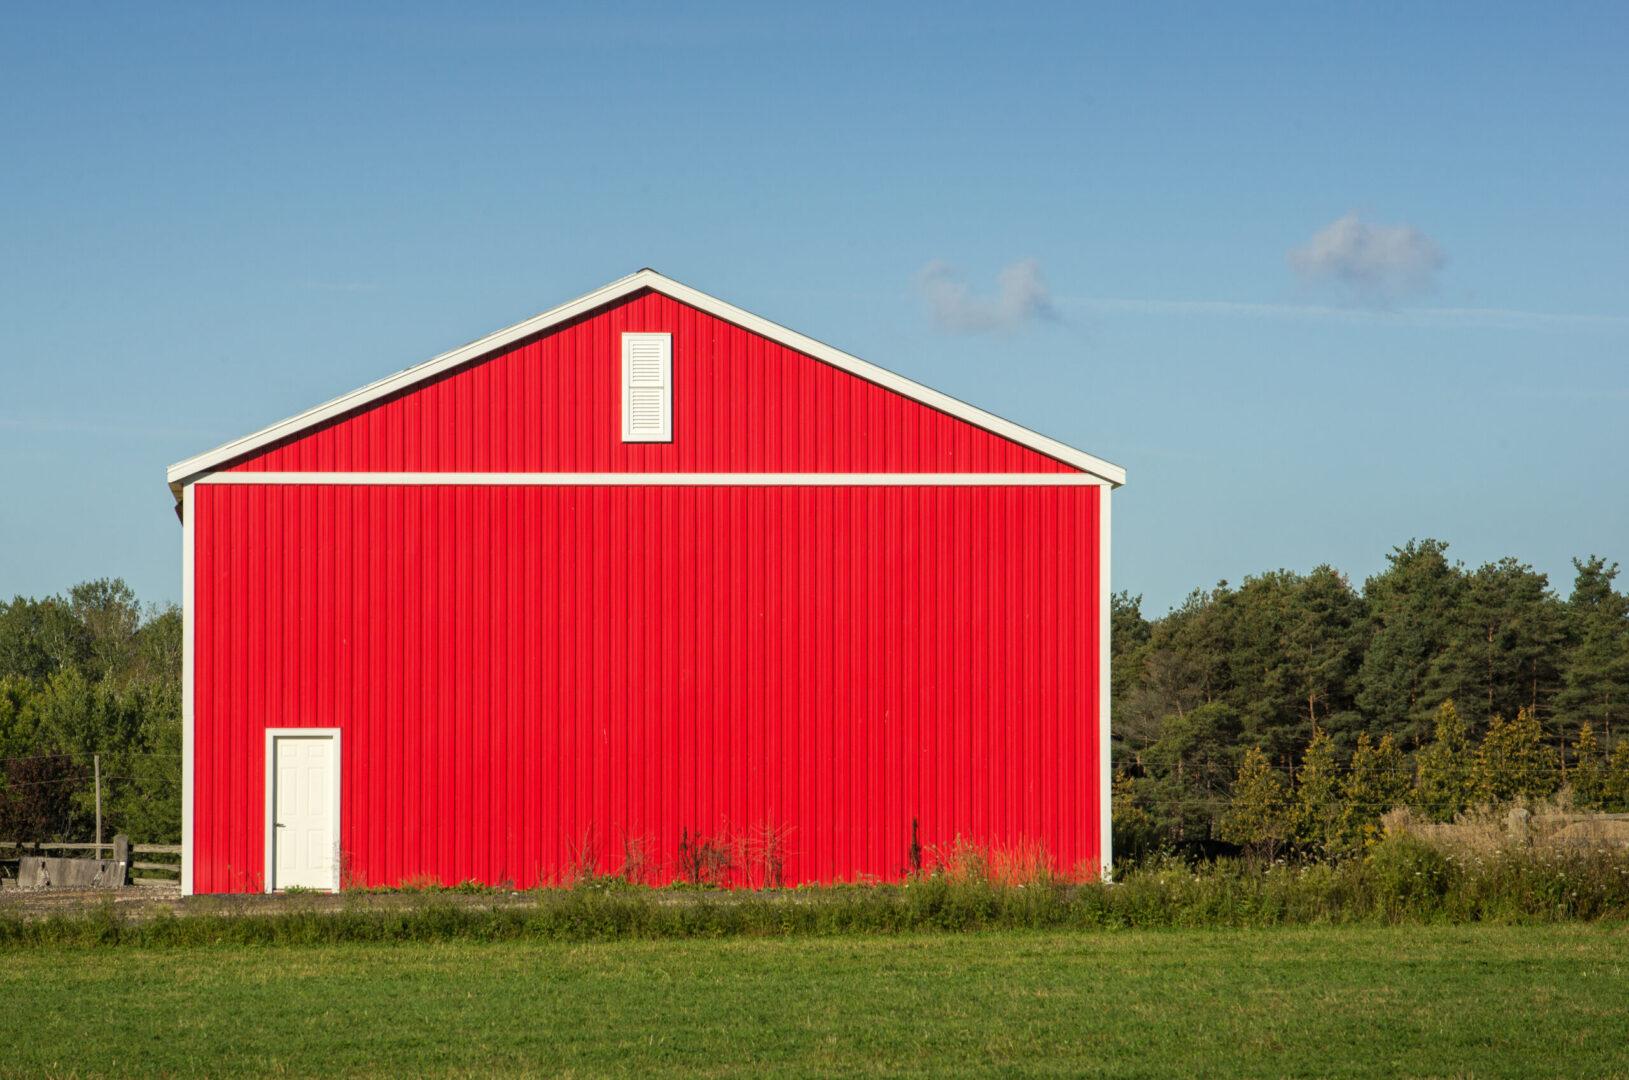 Red Metal Barn